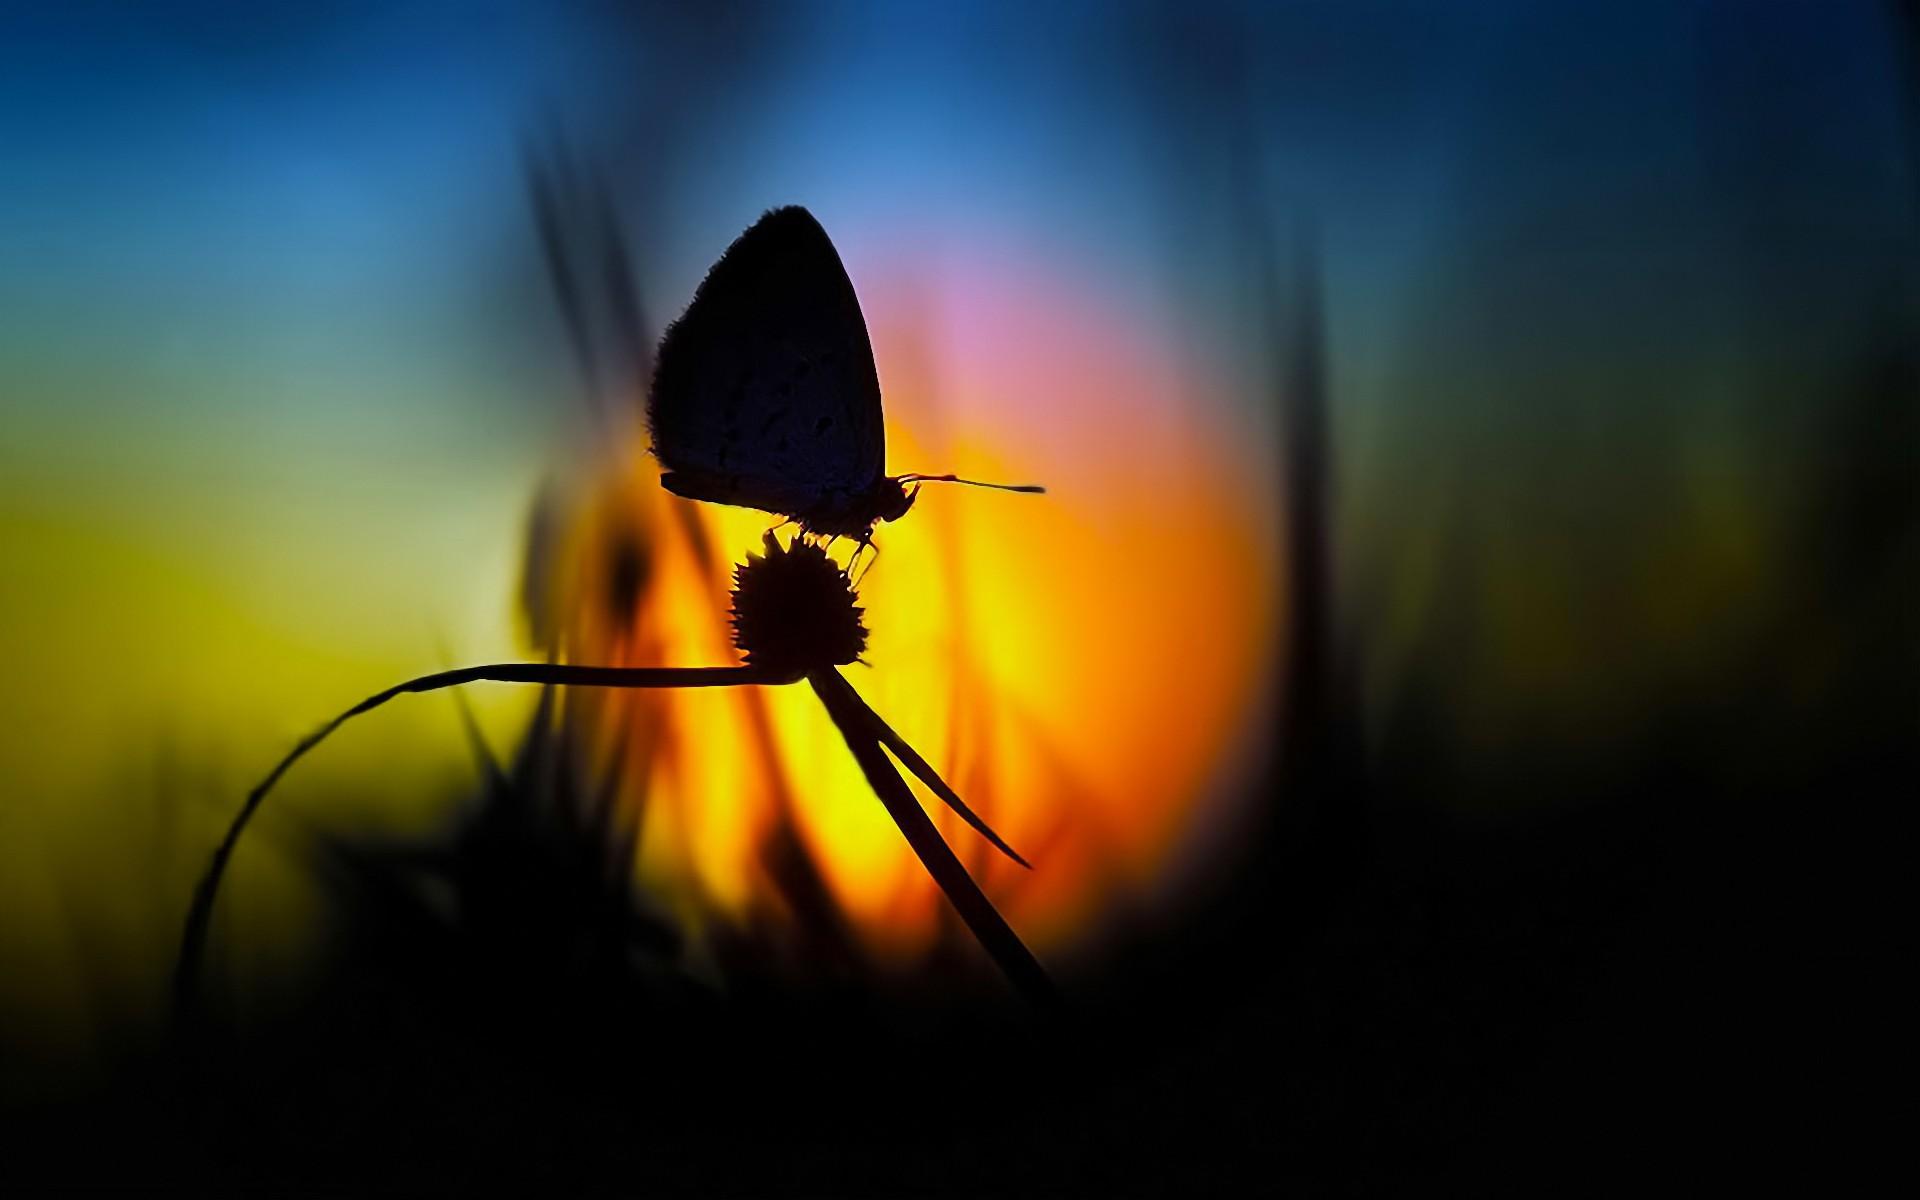 Foto de mariposa en contraluz - 1920x1200